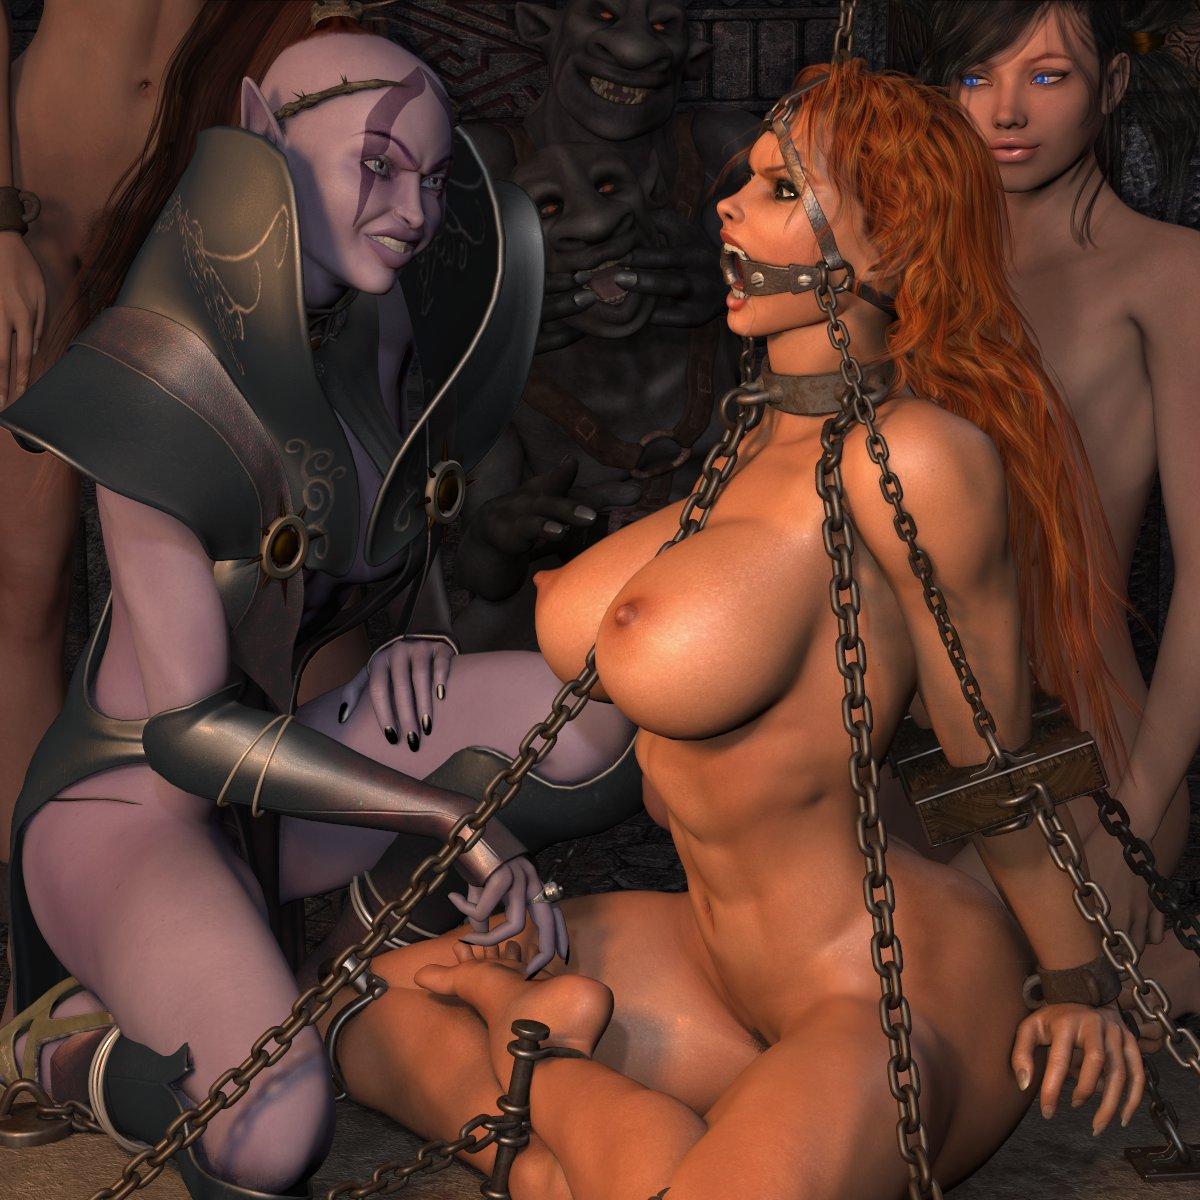 Naked demon amime sex slaves